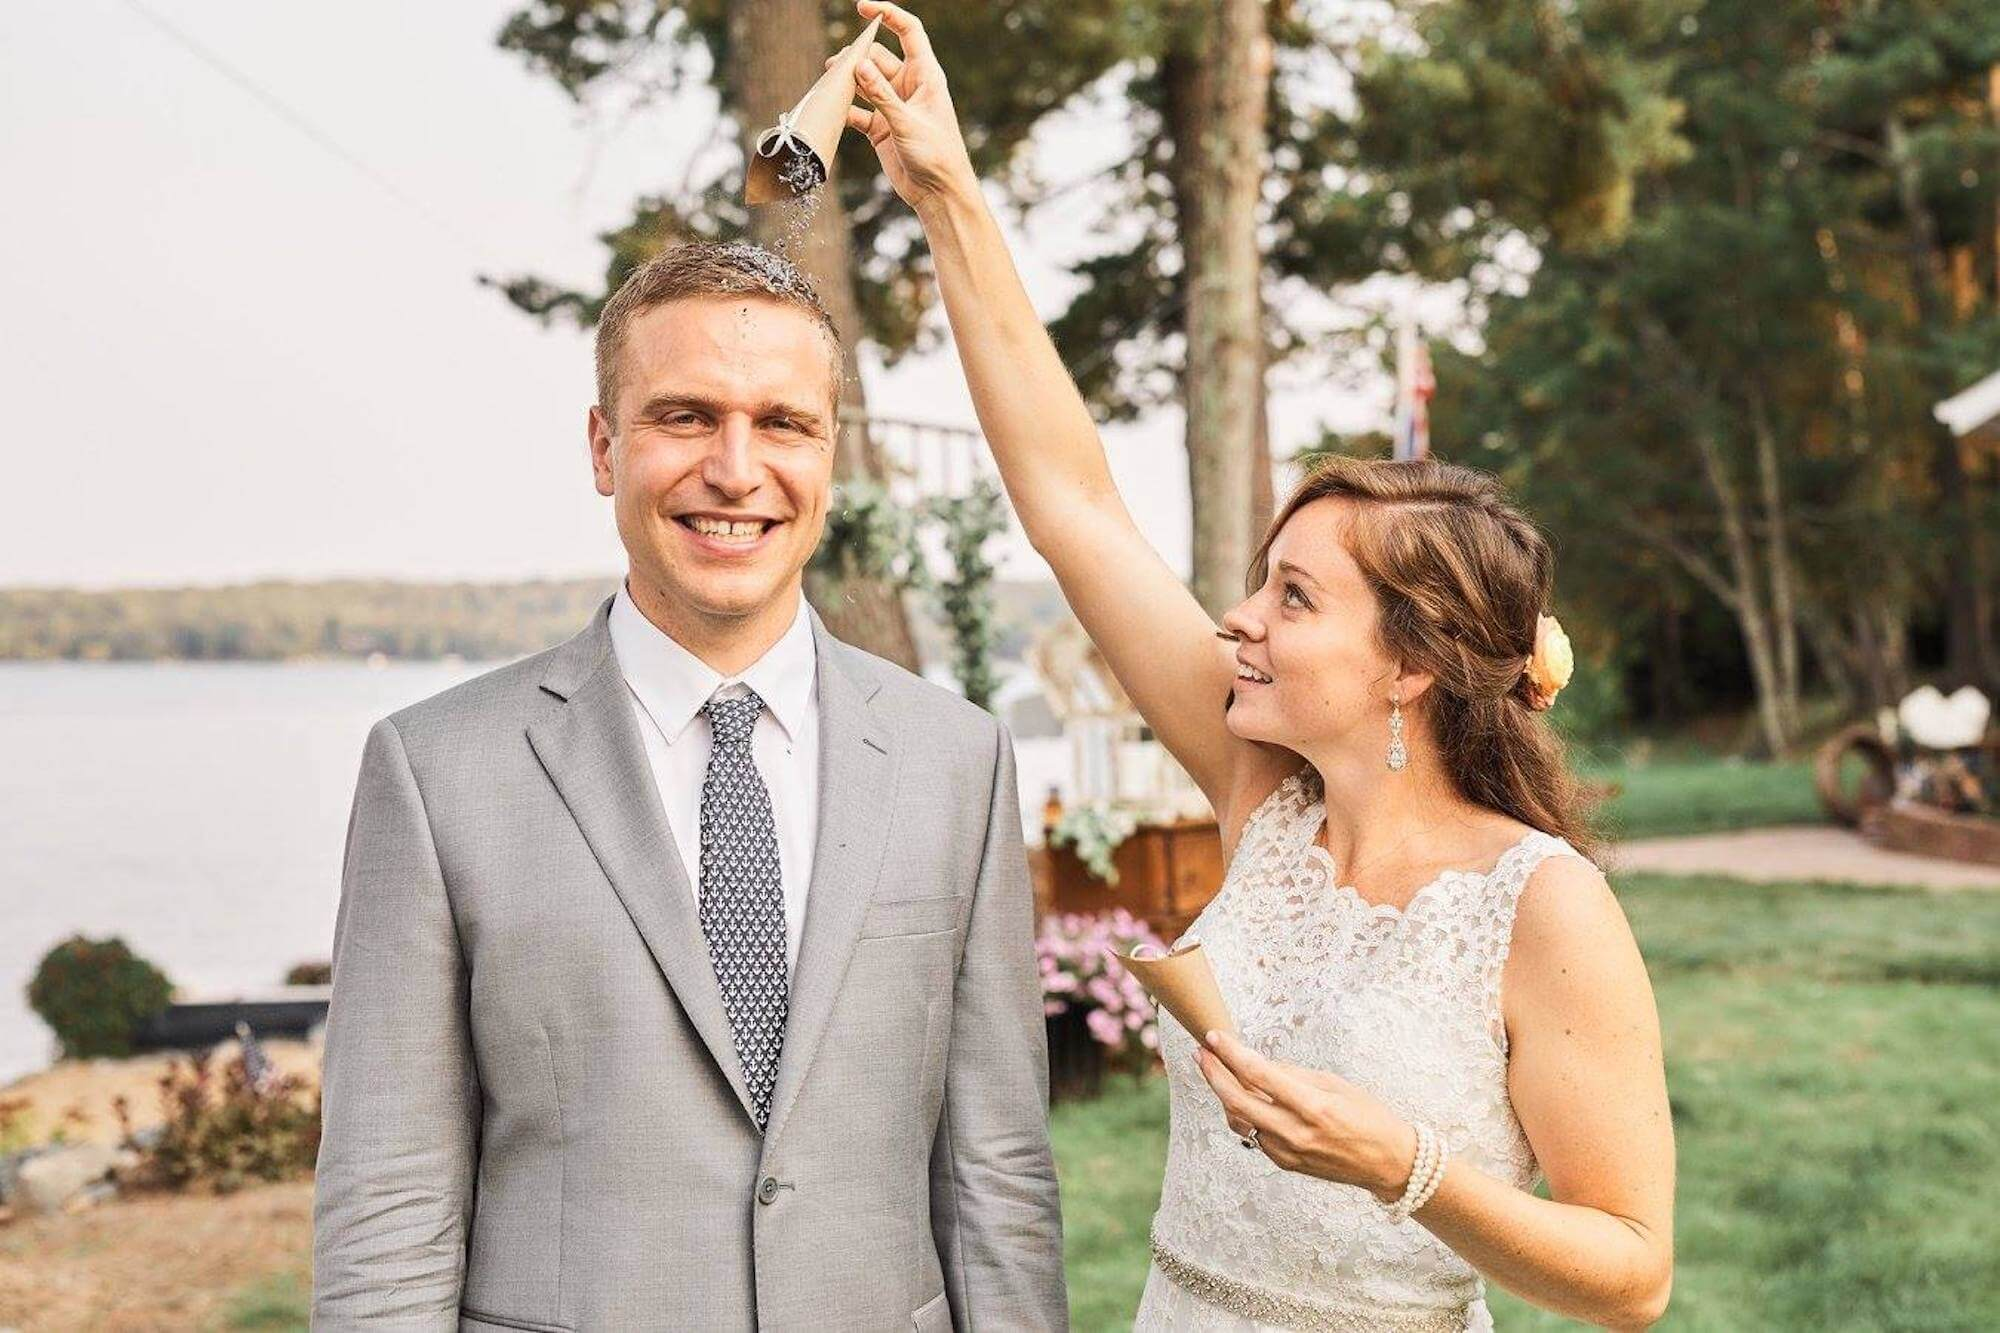 engle-olson-wedding-video-perry-james-photography-53.jpg